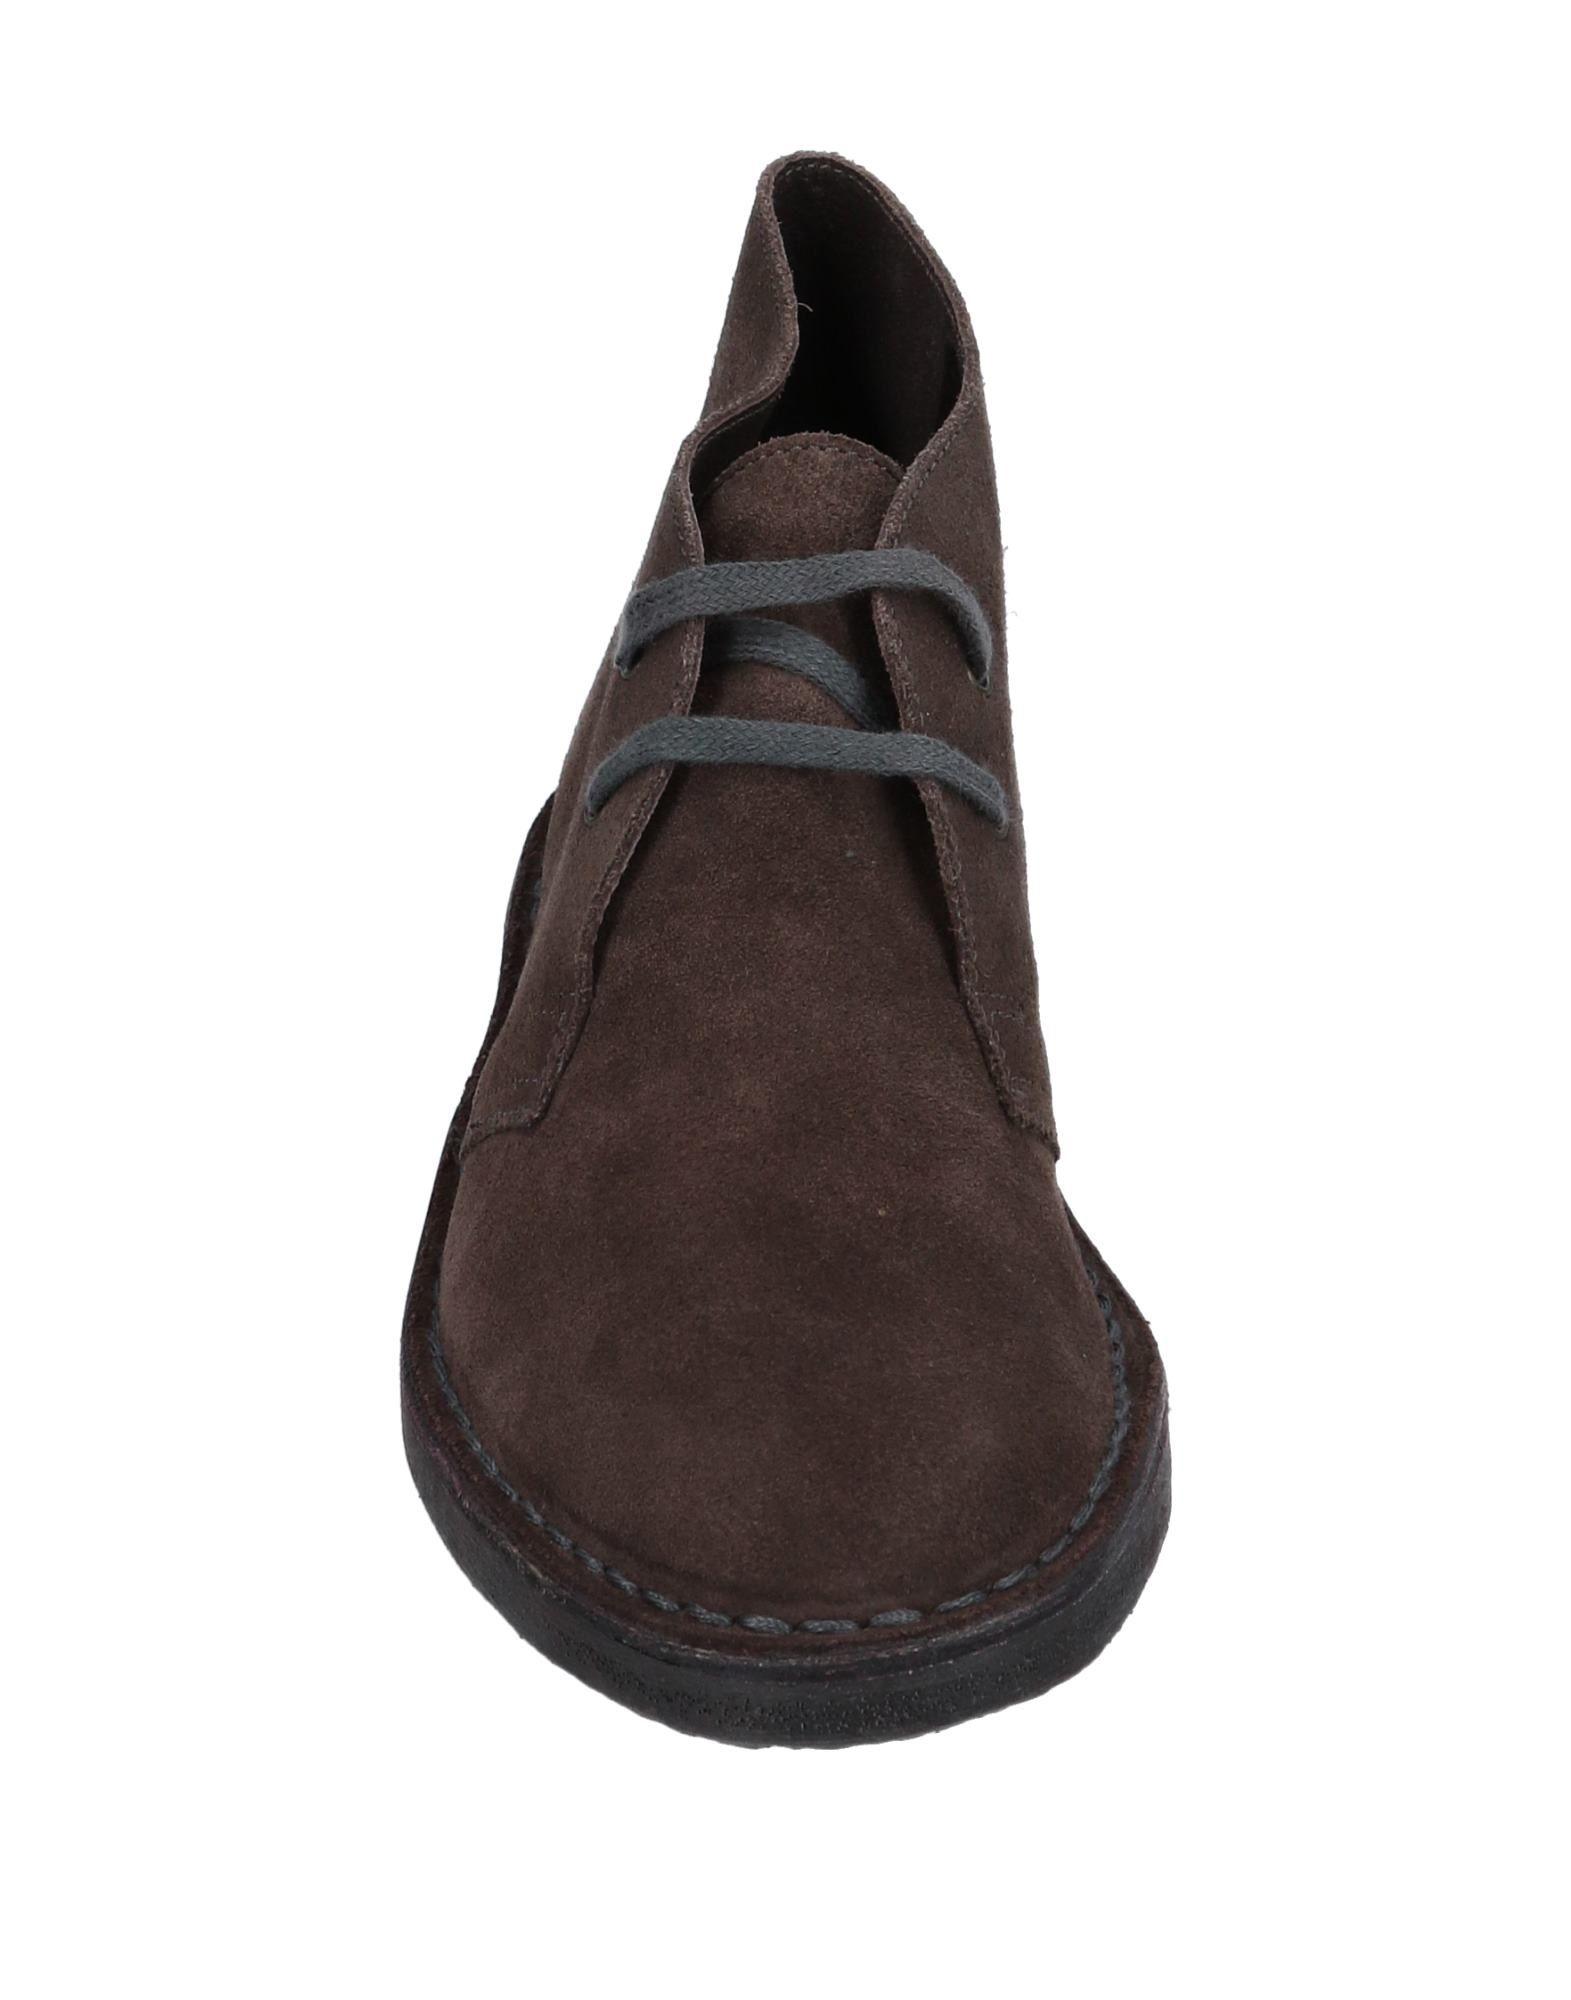 Antica Cuoieria Boots Boots - Men Antica Cuoieria Boots Boots online on  United Kingdom - 11546777FG 577fc3